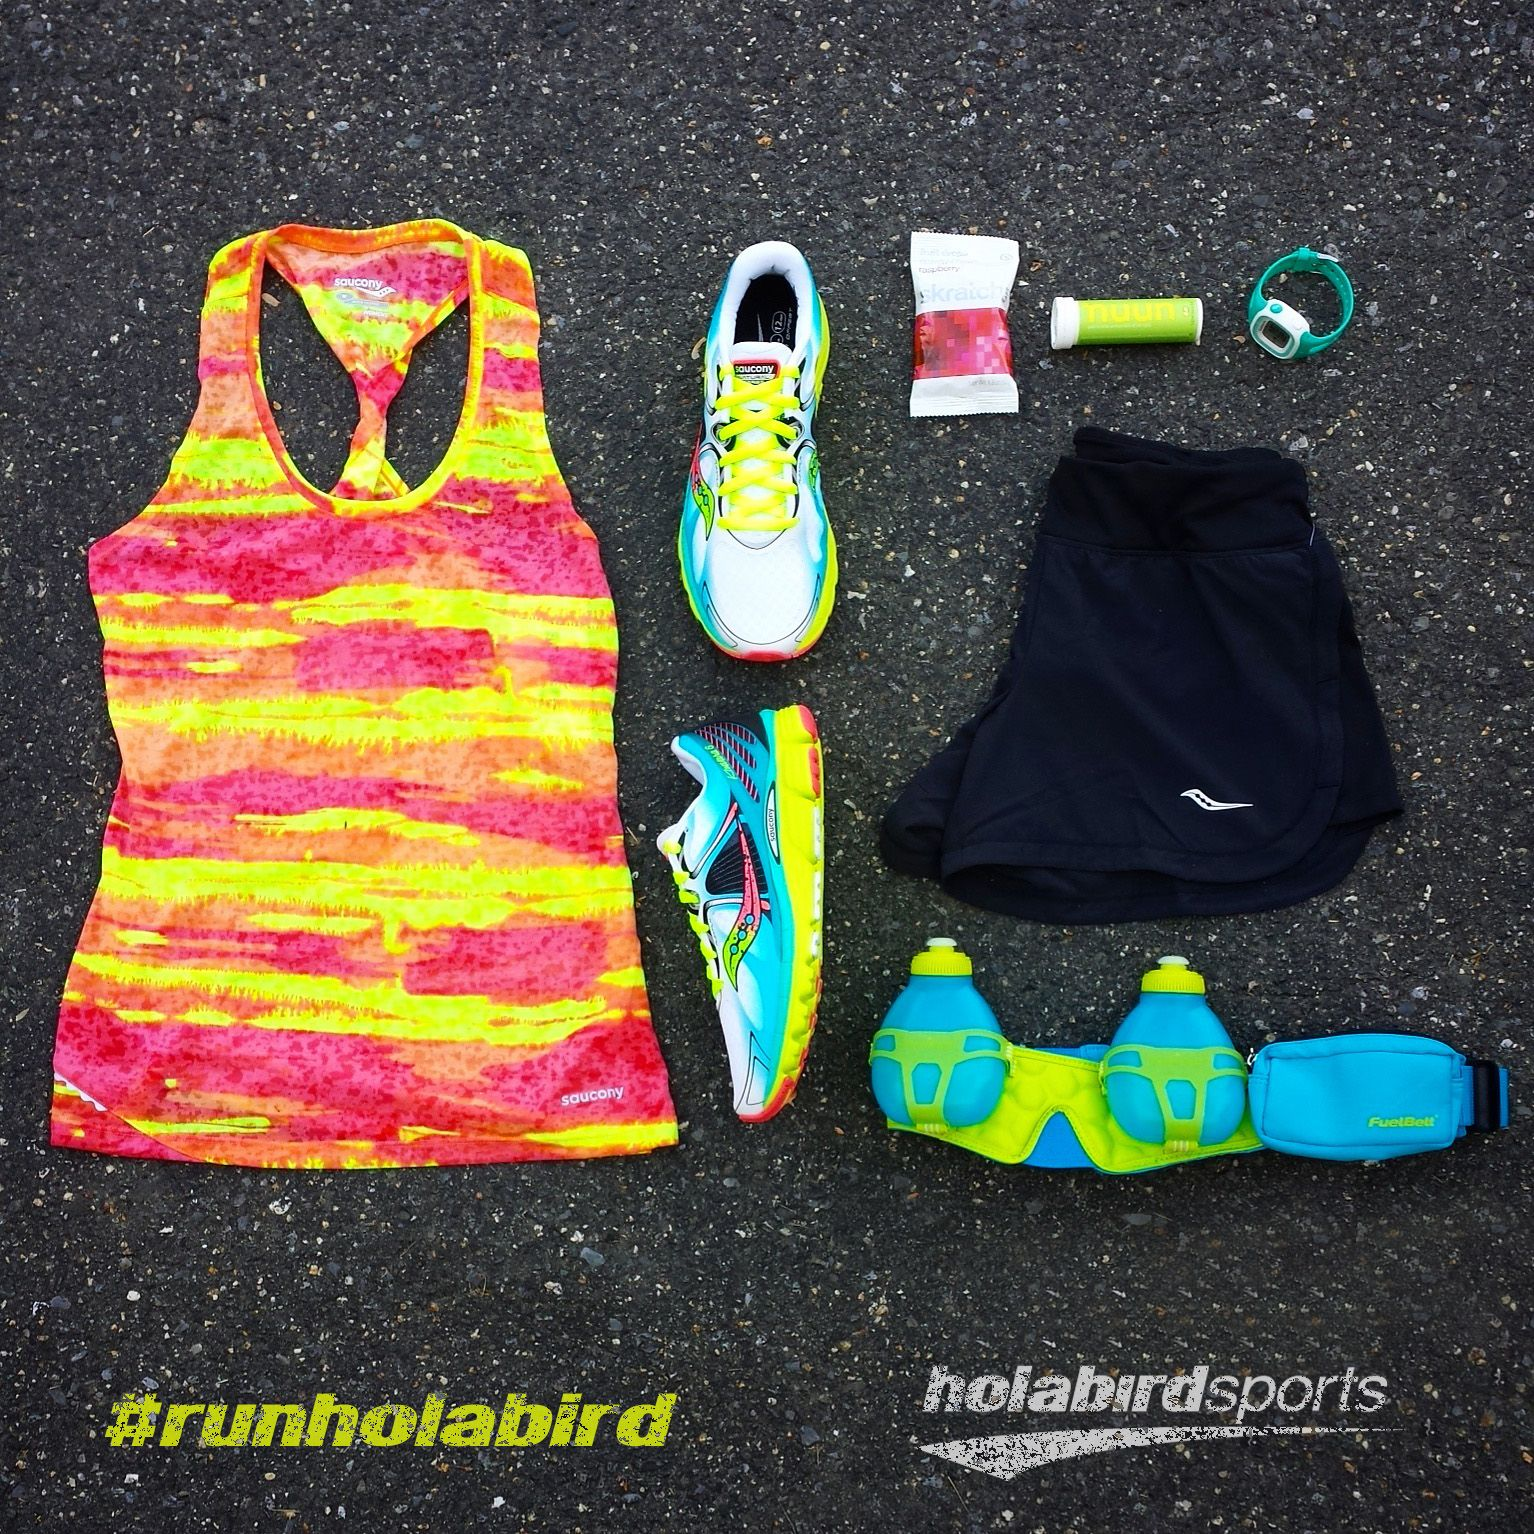 saucony running gear